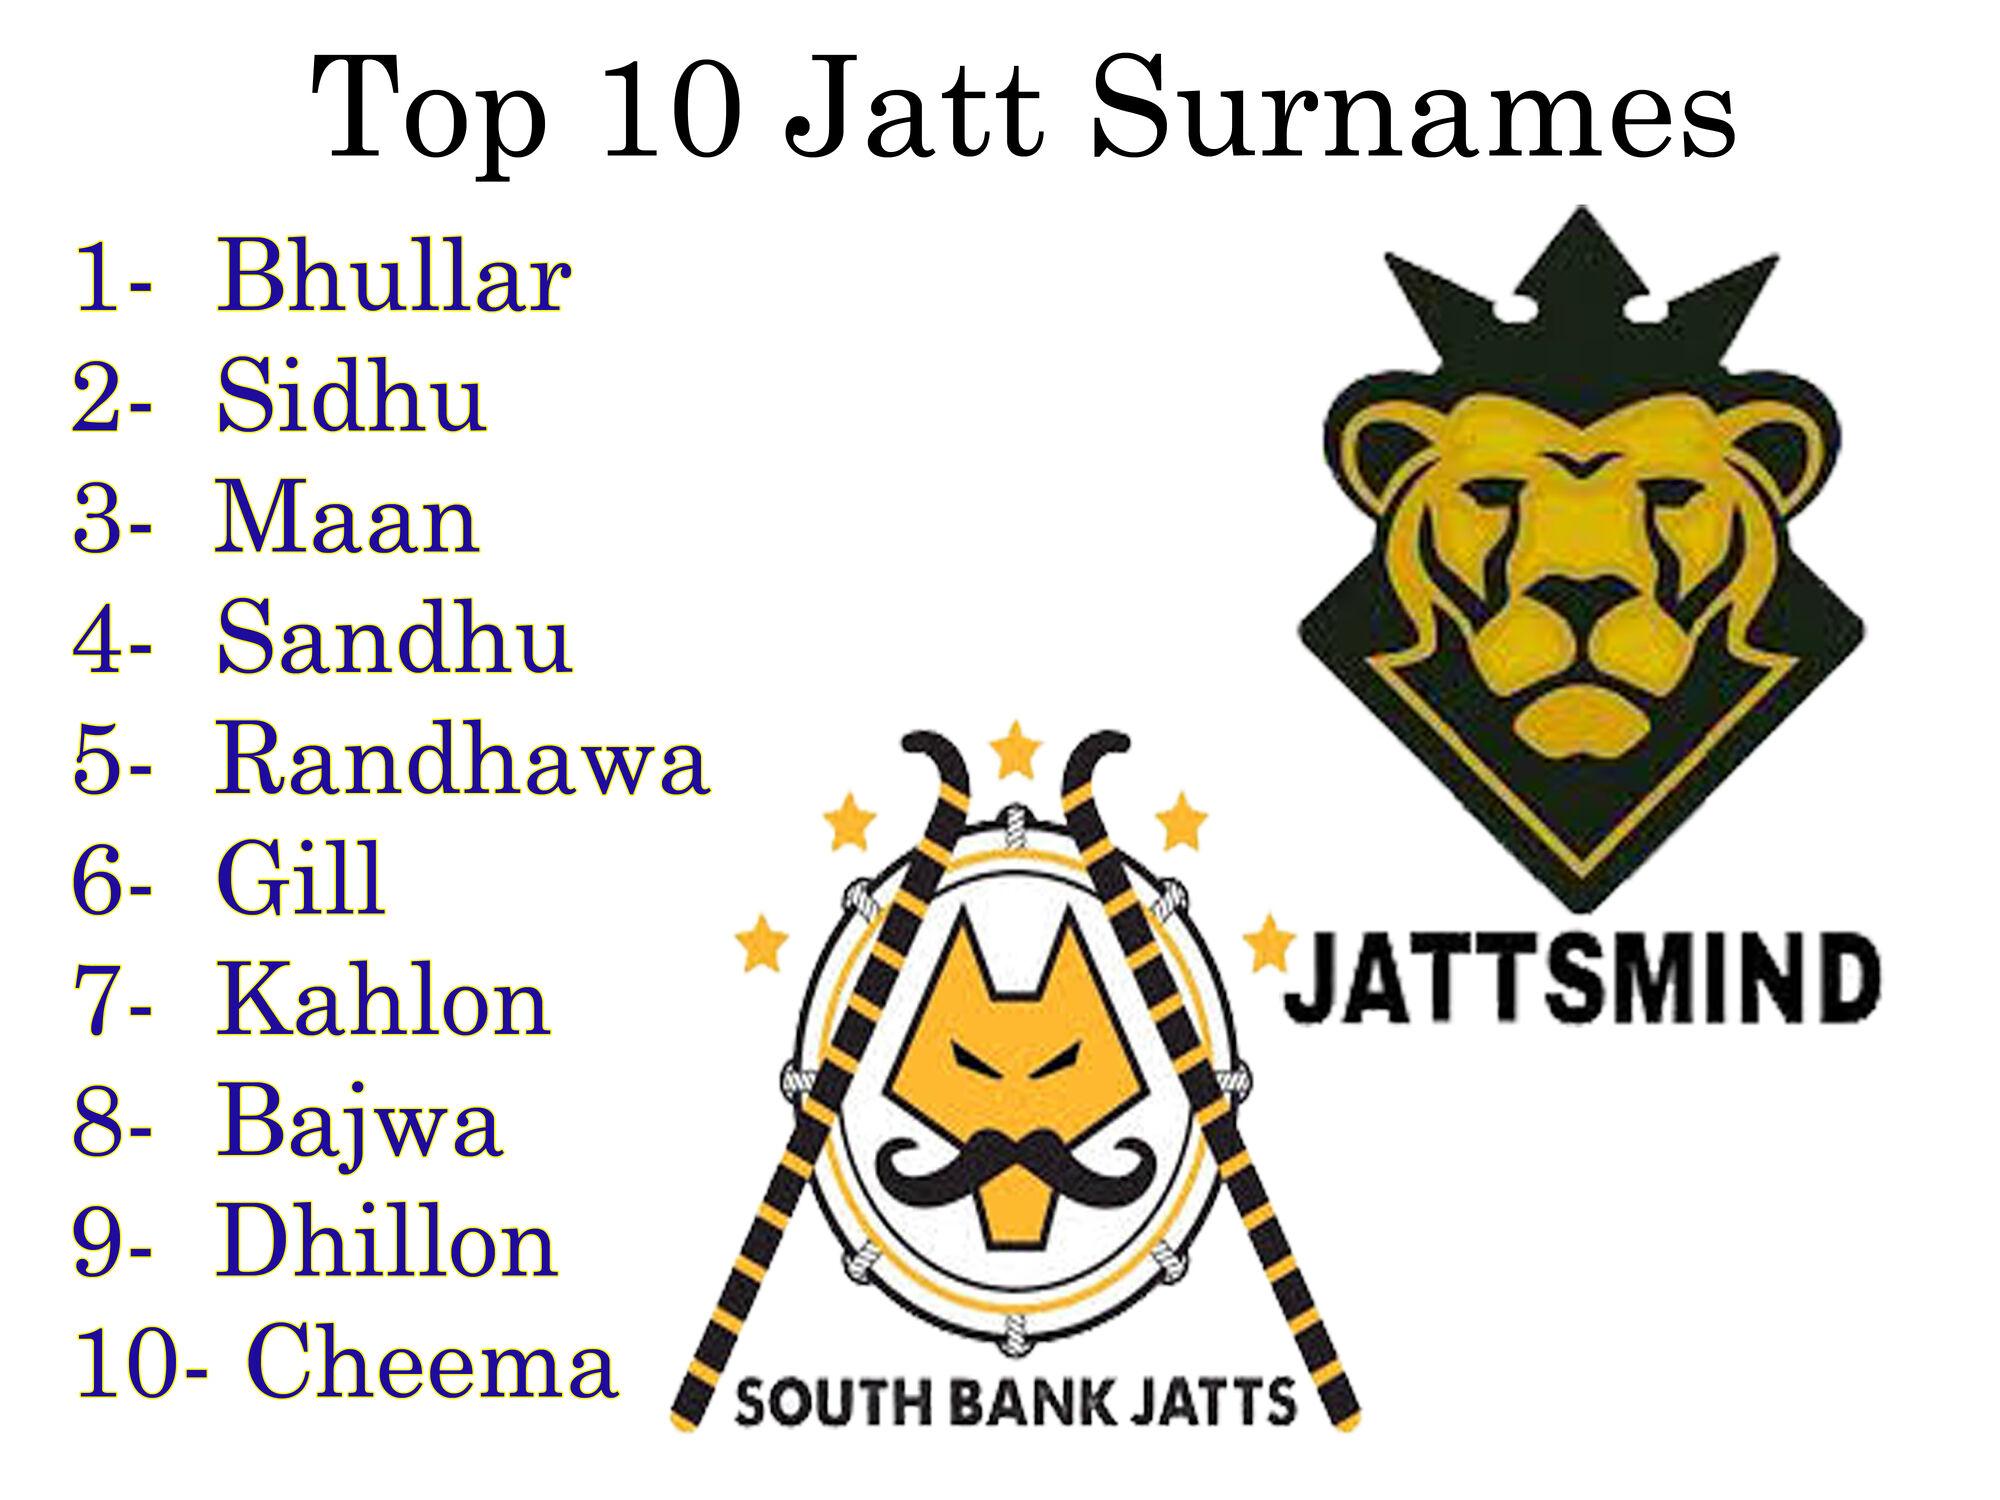 Top 10 Jatt Surnames | Sikhi Wiki | FANDOM powered by Wikia